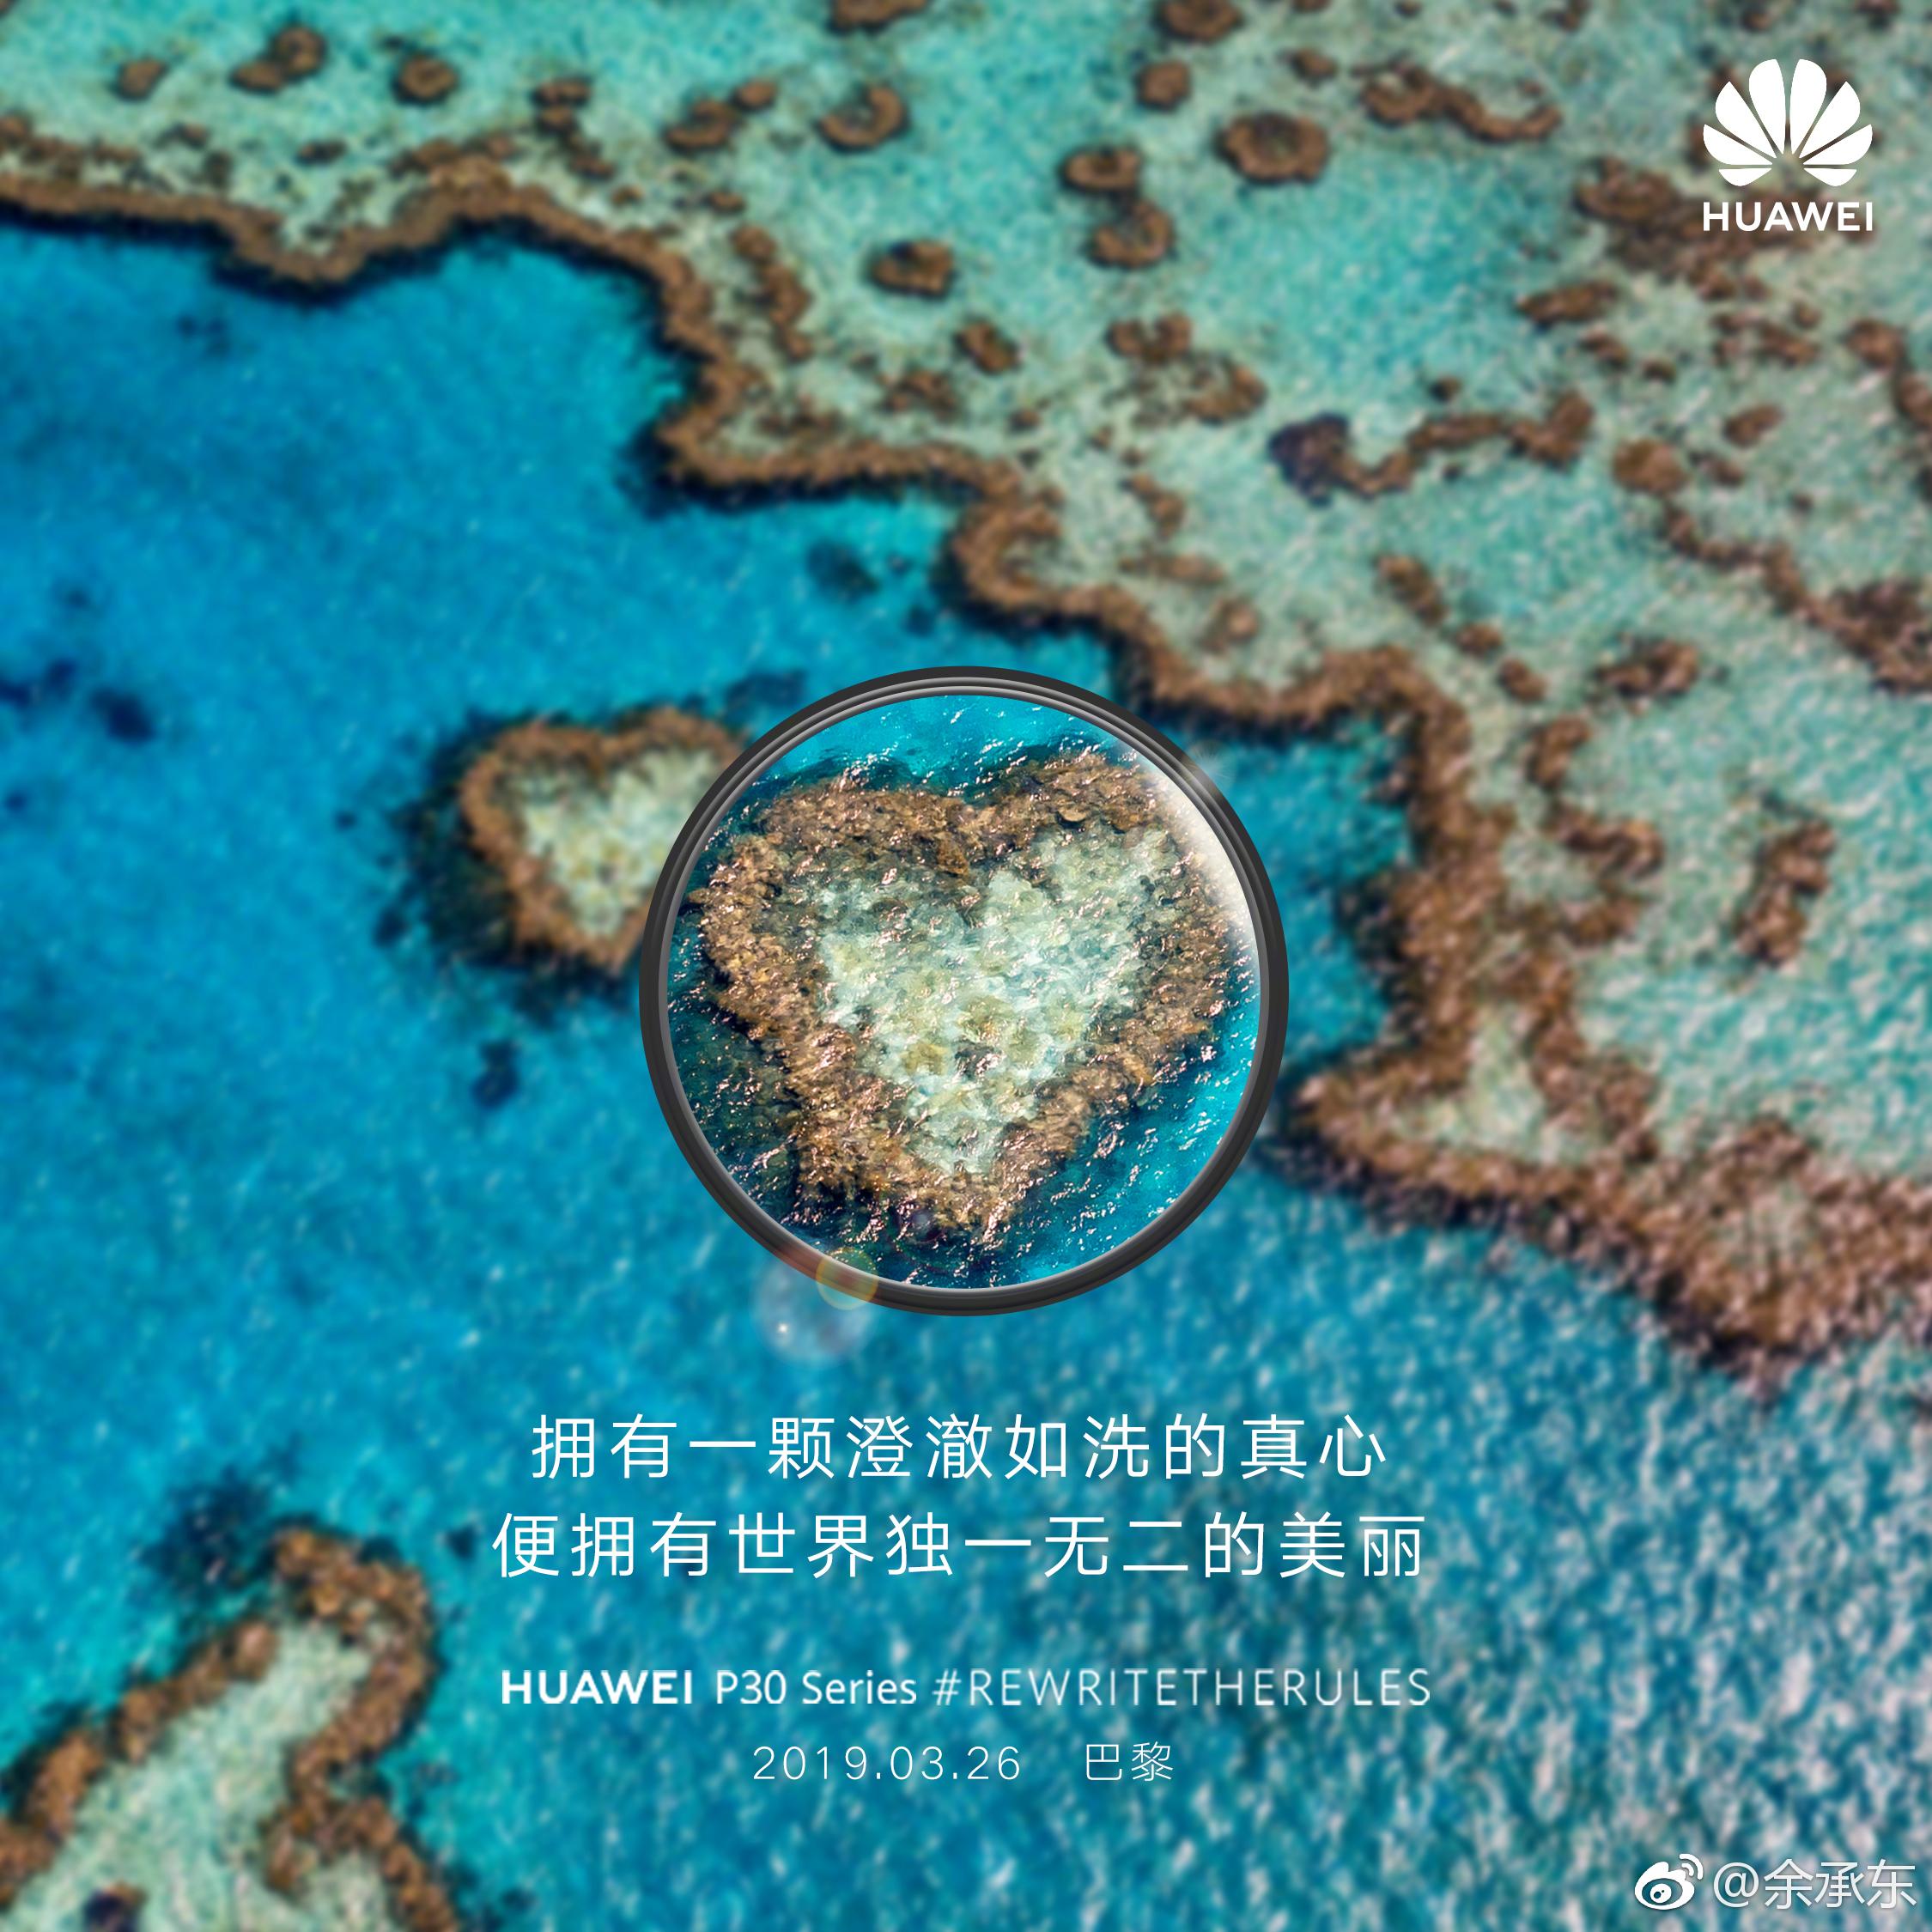 Huawei P30 Pro handled in a live video, UD fingerprint reader tested